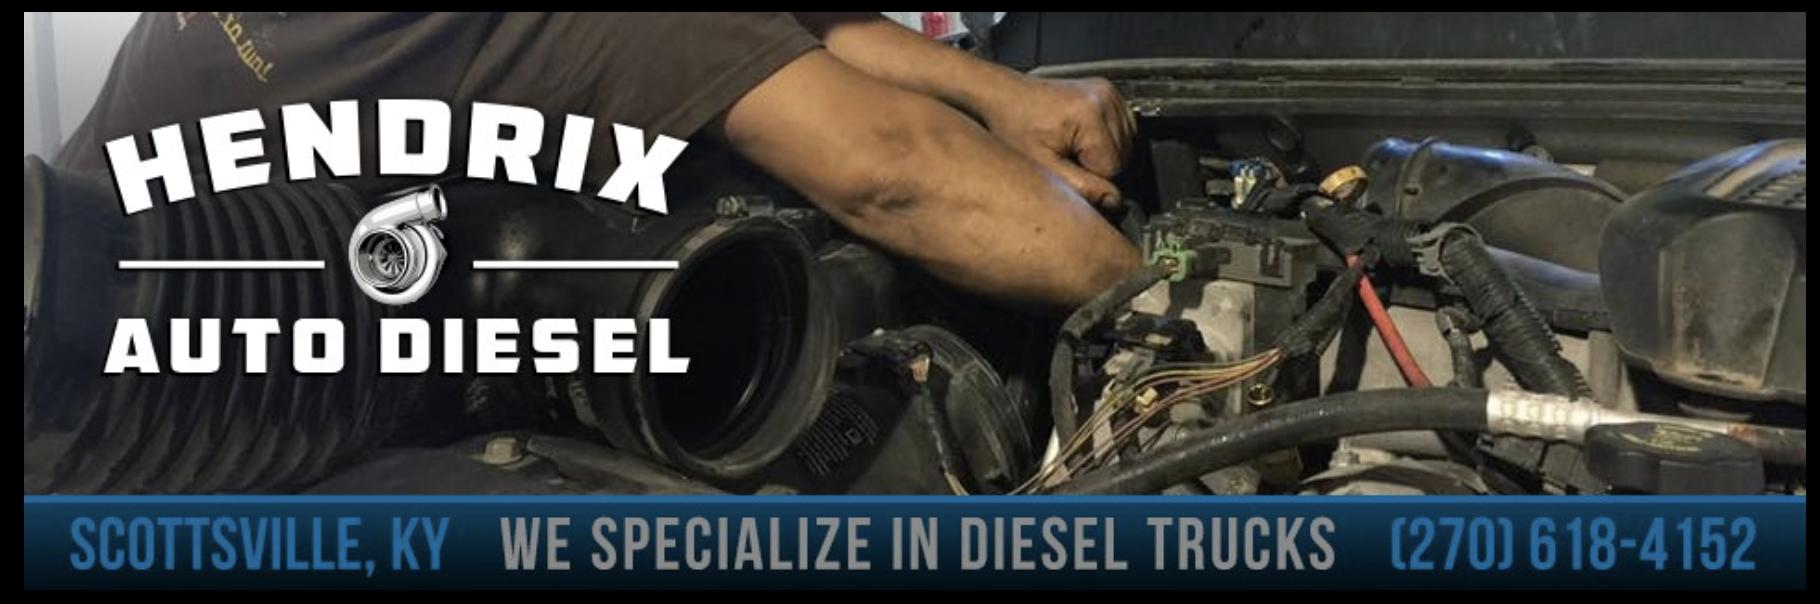 Hendrix Auto Diesel image 2